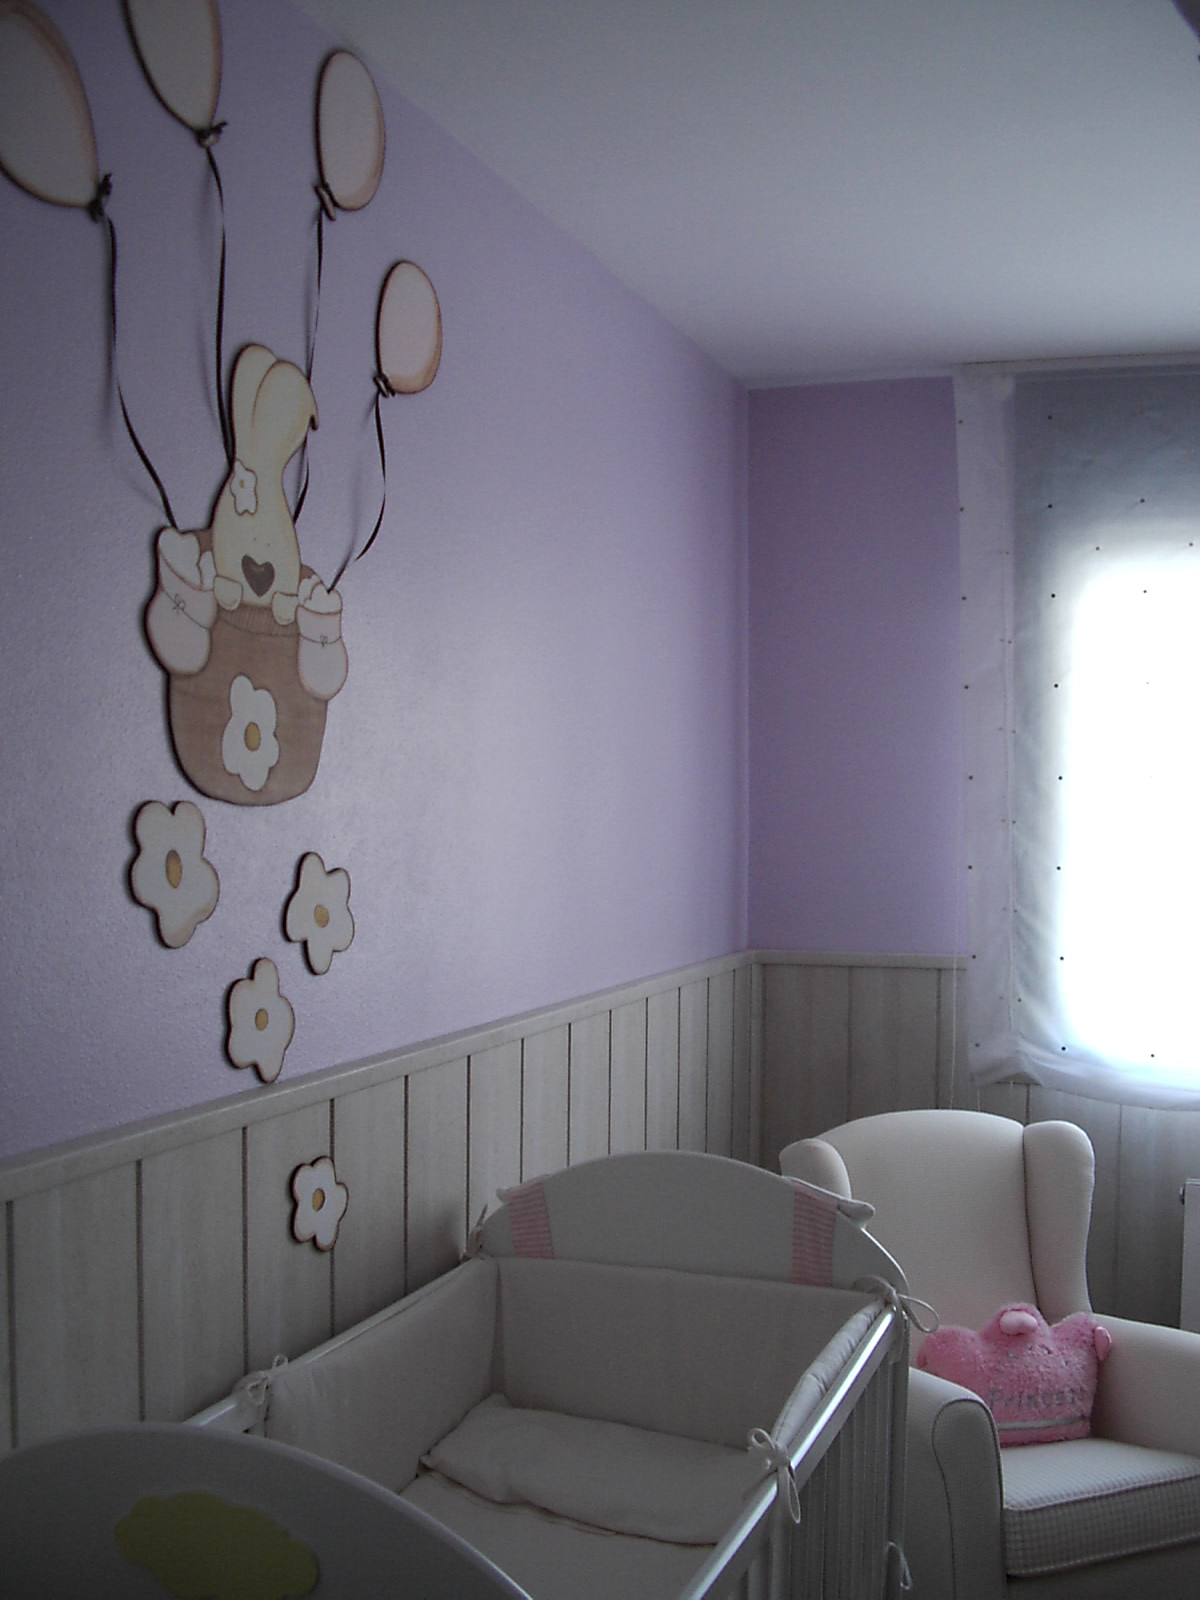 deco chambre b b d coration chambre b b fille. Black Bedroom Furniture Sets. Home Design Ideas